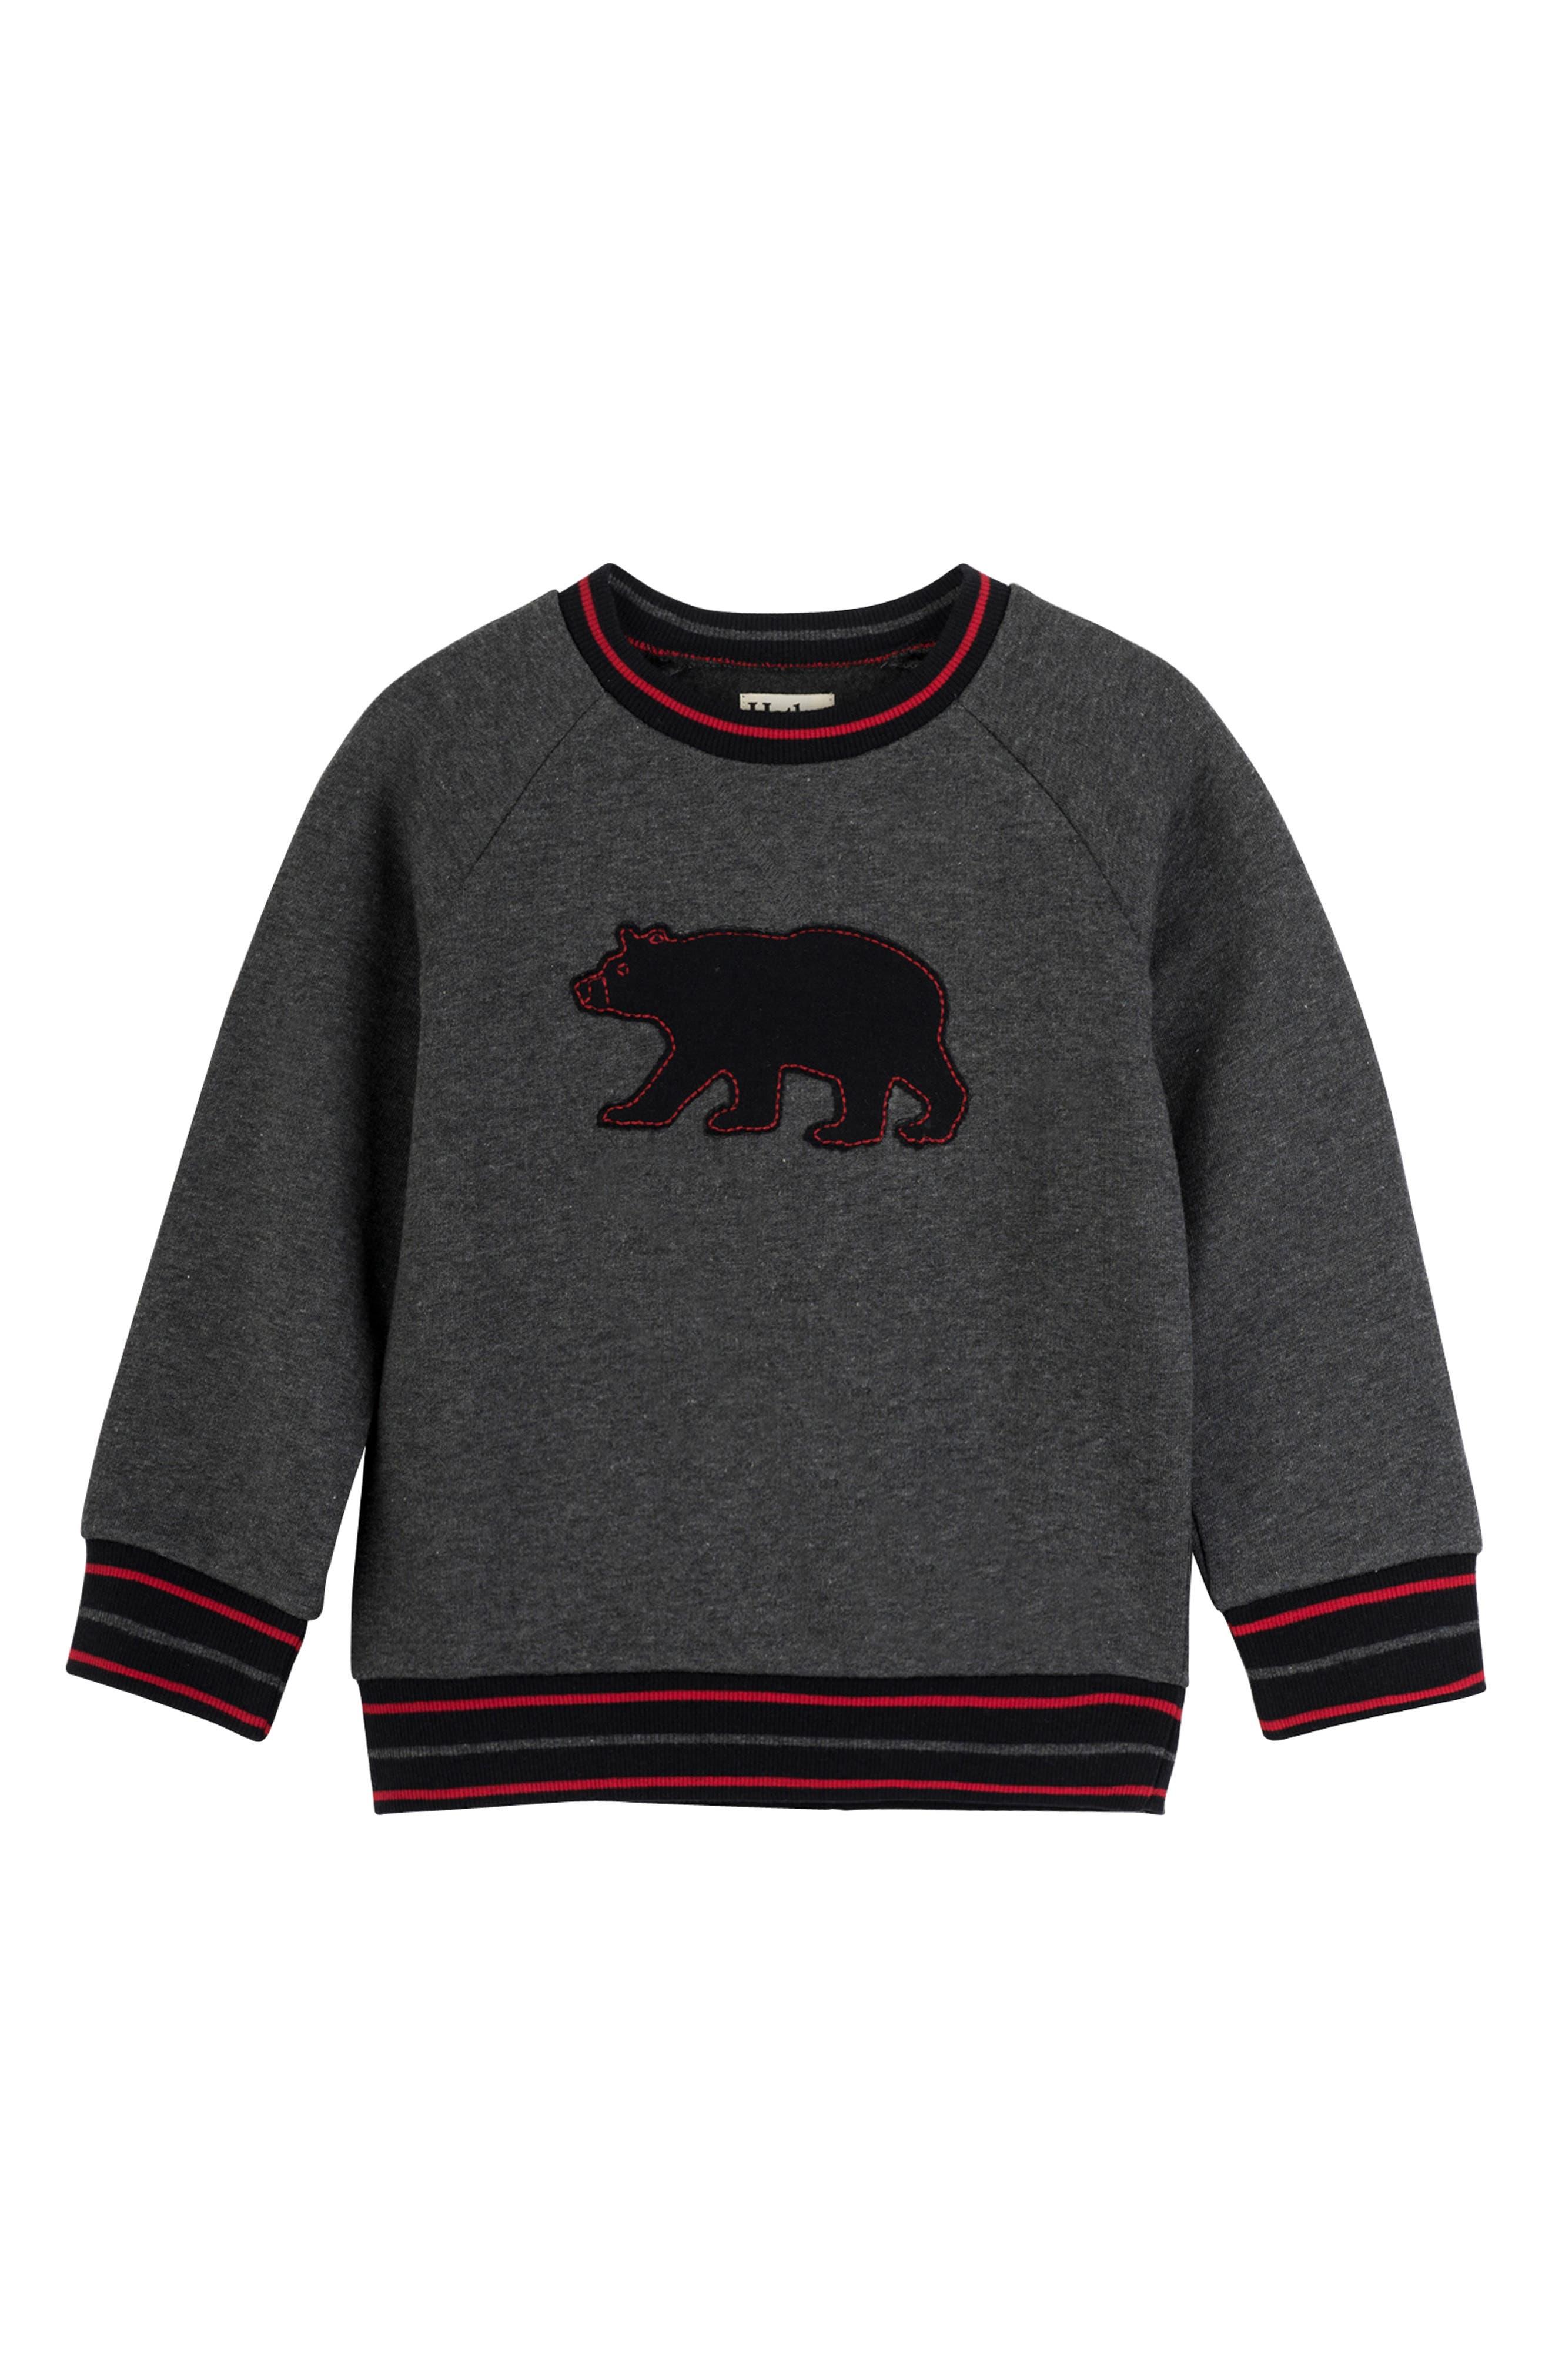 Bear Sweatshirt,                         Main,                         color, BLACK BEAR